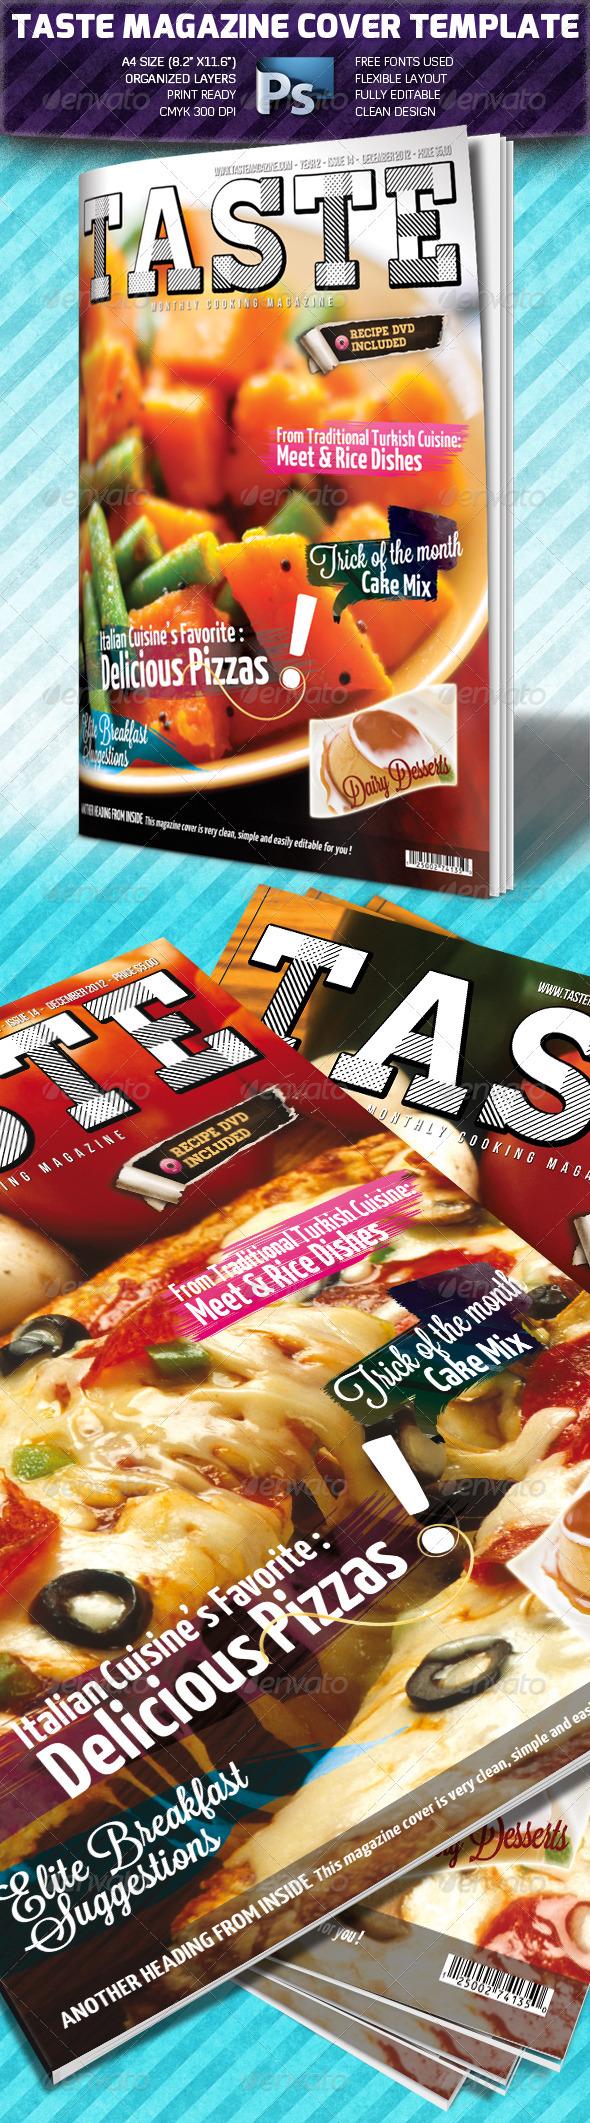 Taste A4 Magazine Cover Template - Magazines Print Templates